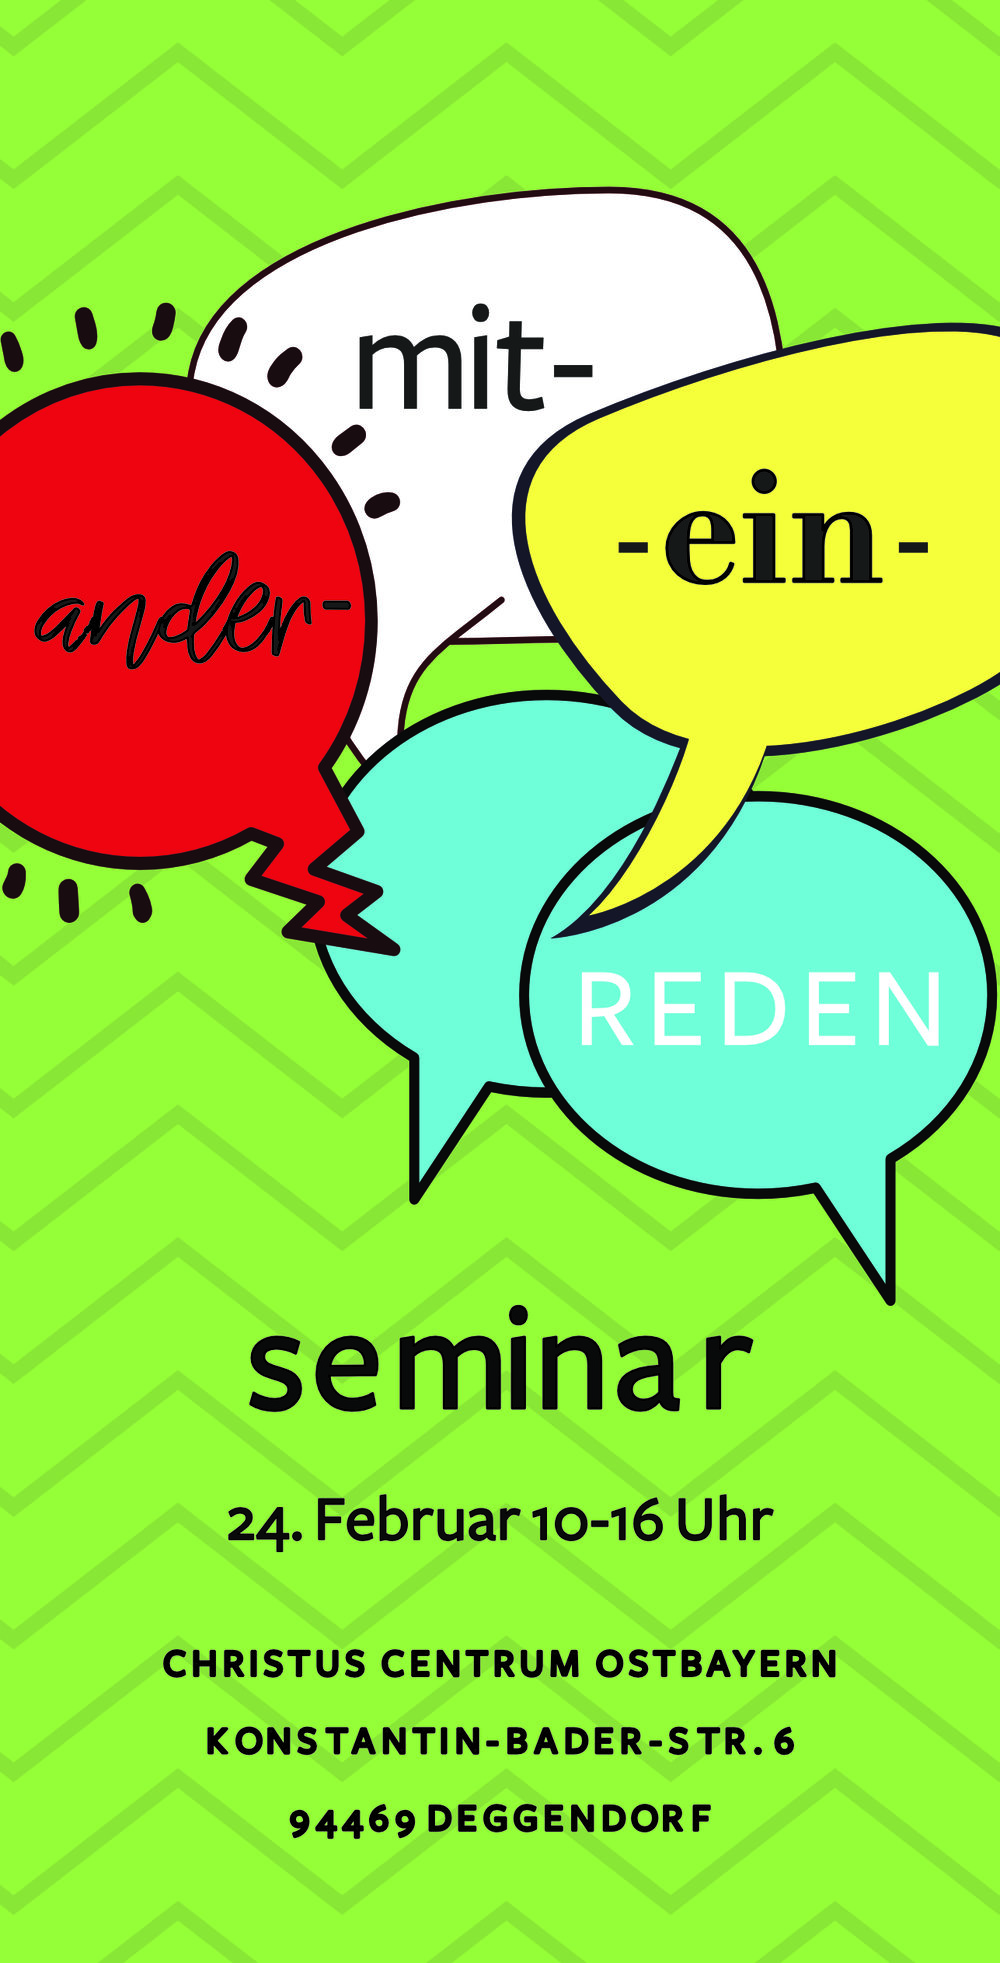 K-Seminar Vorne.jpg